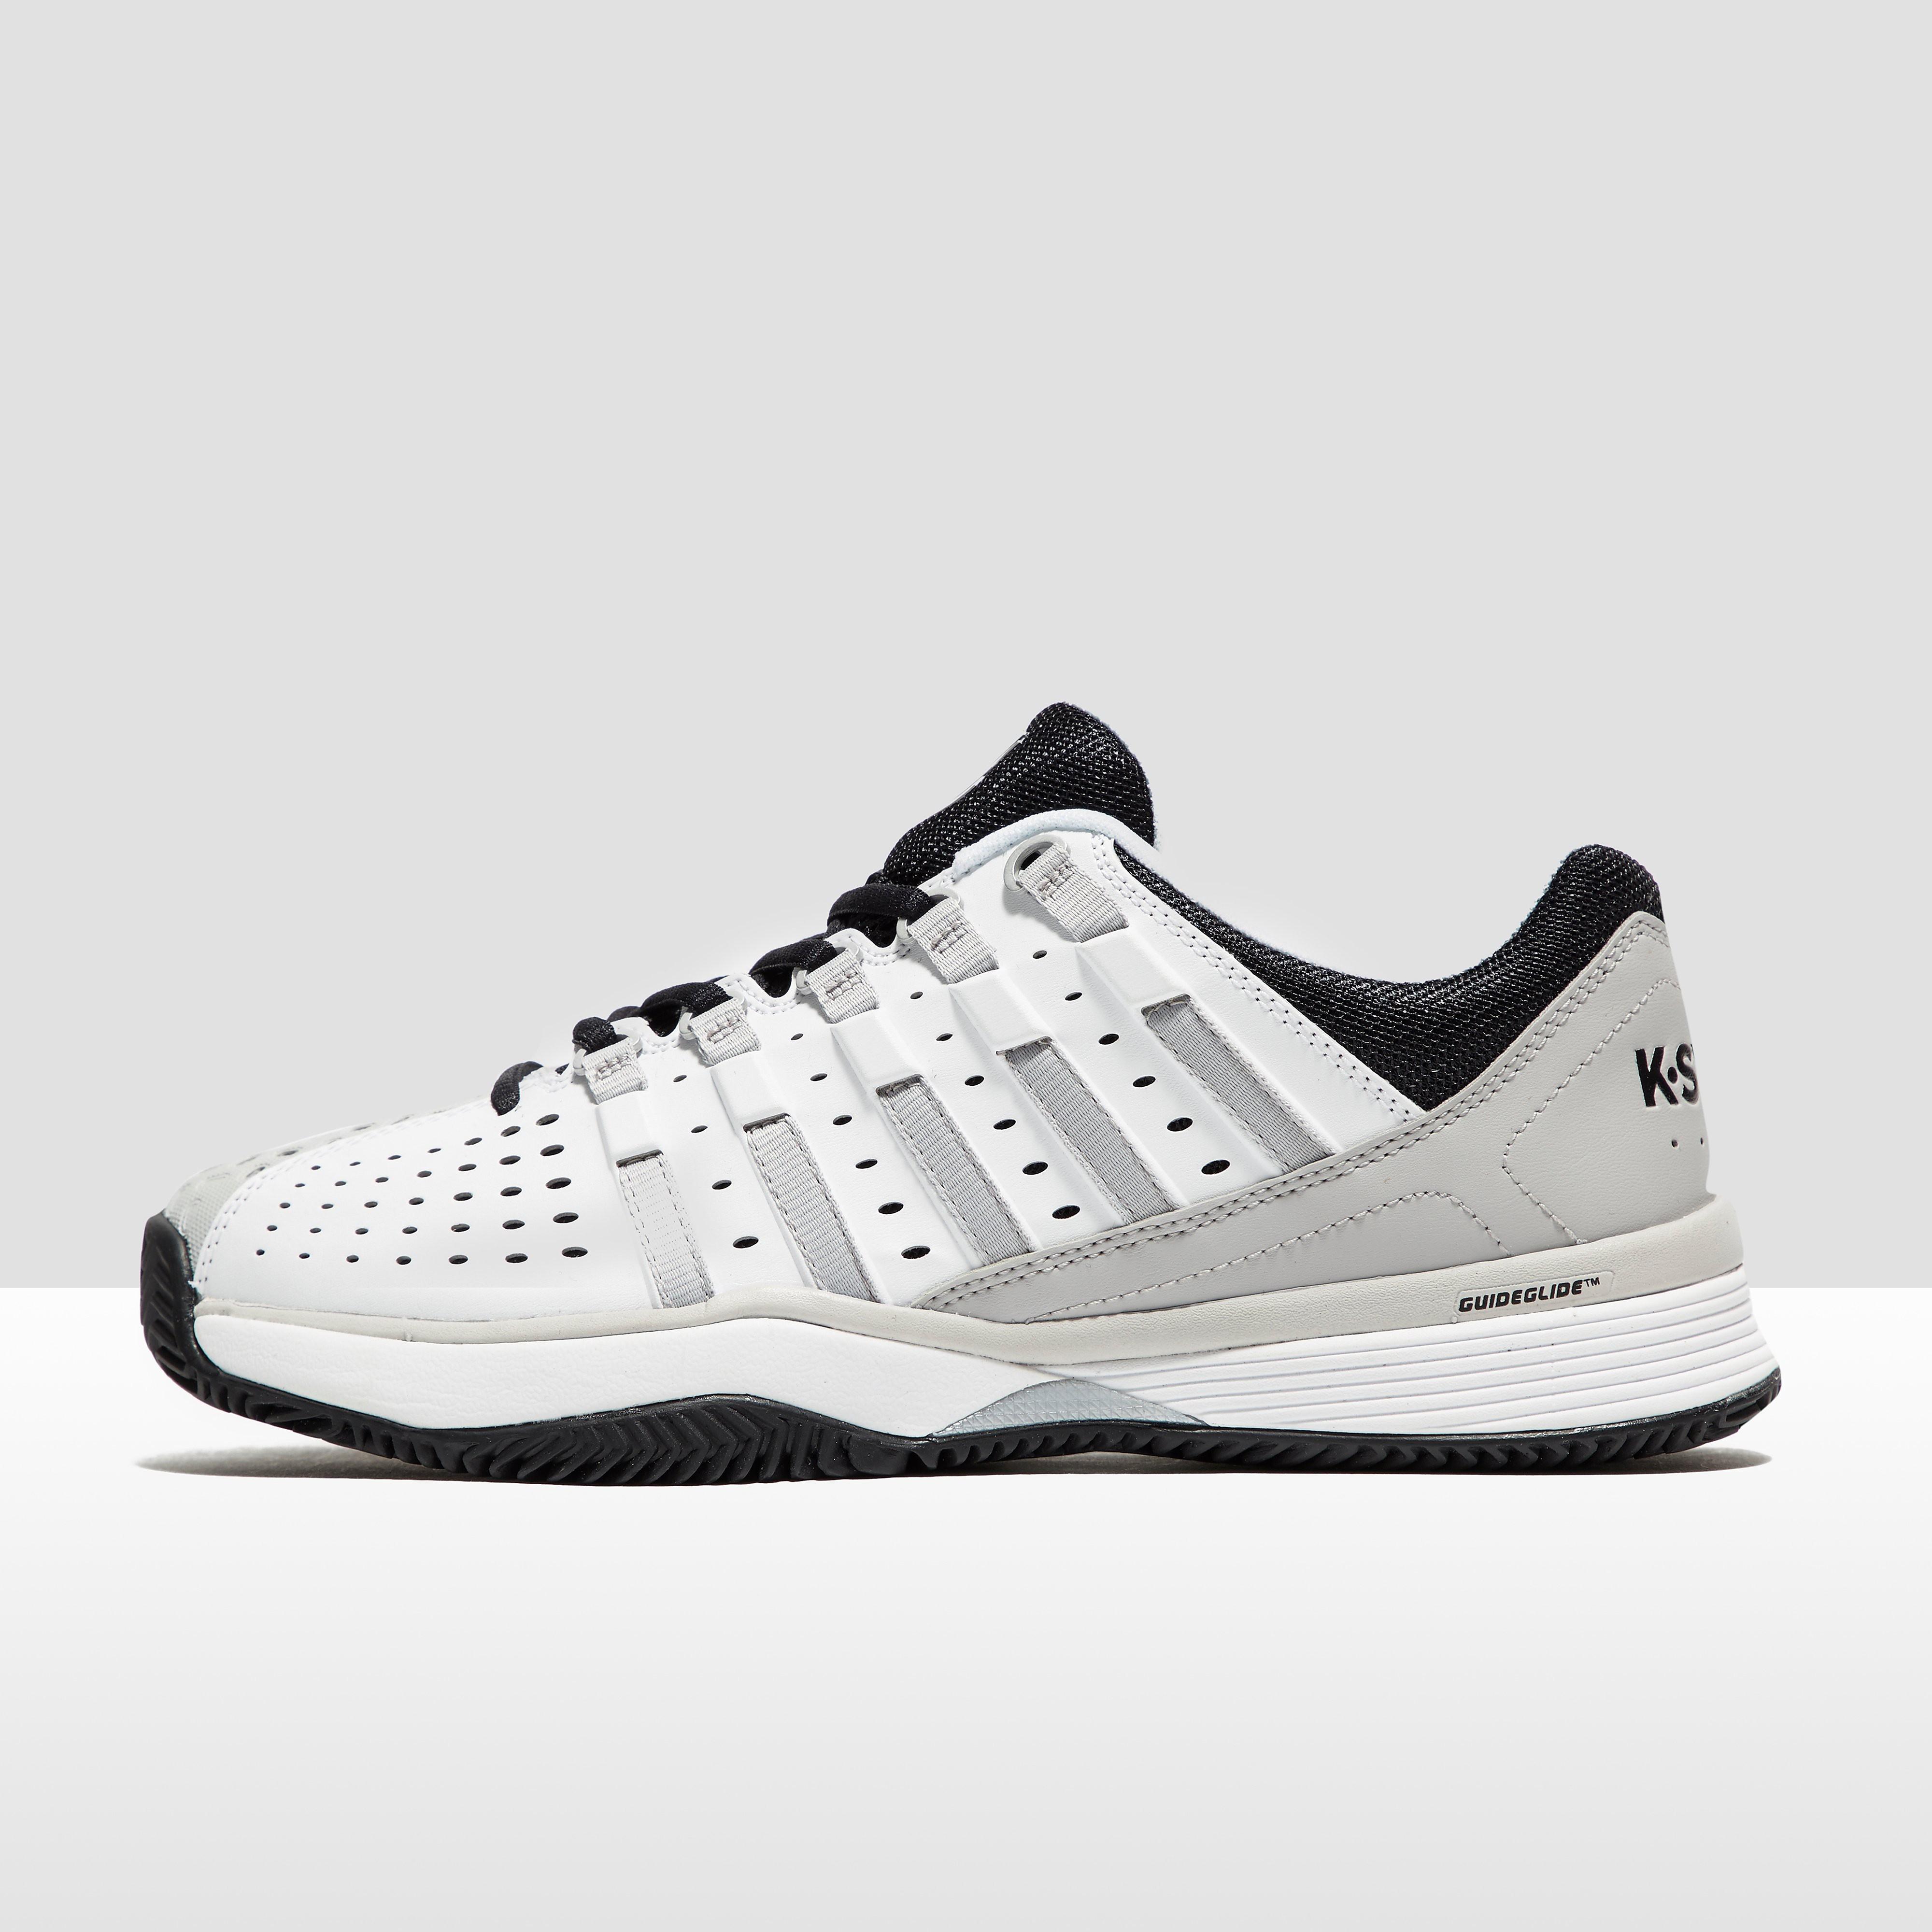 K-Swiss Hypermatch HB Men's Tennis Shoes